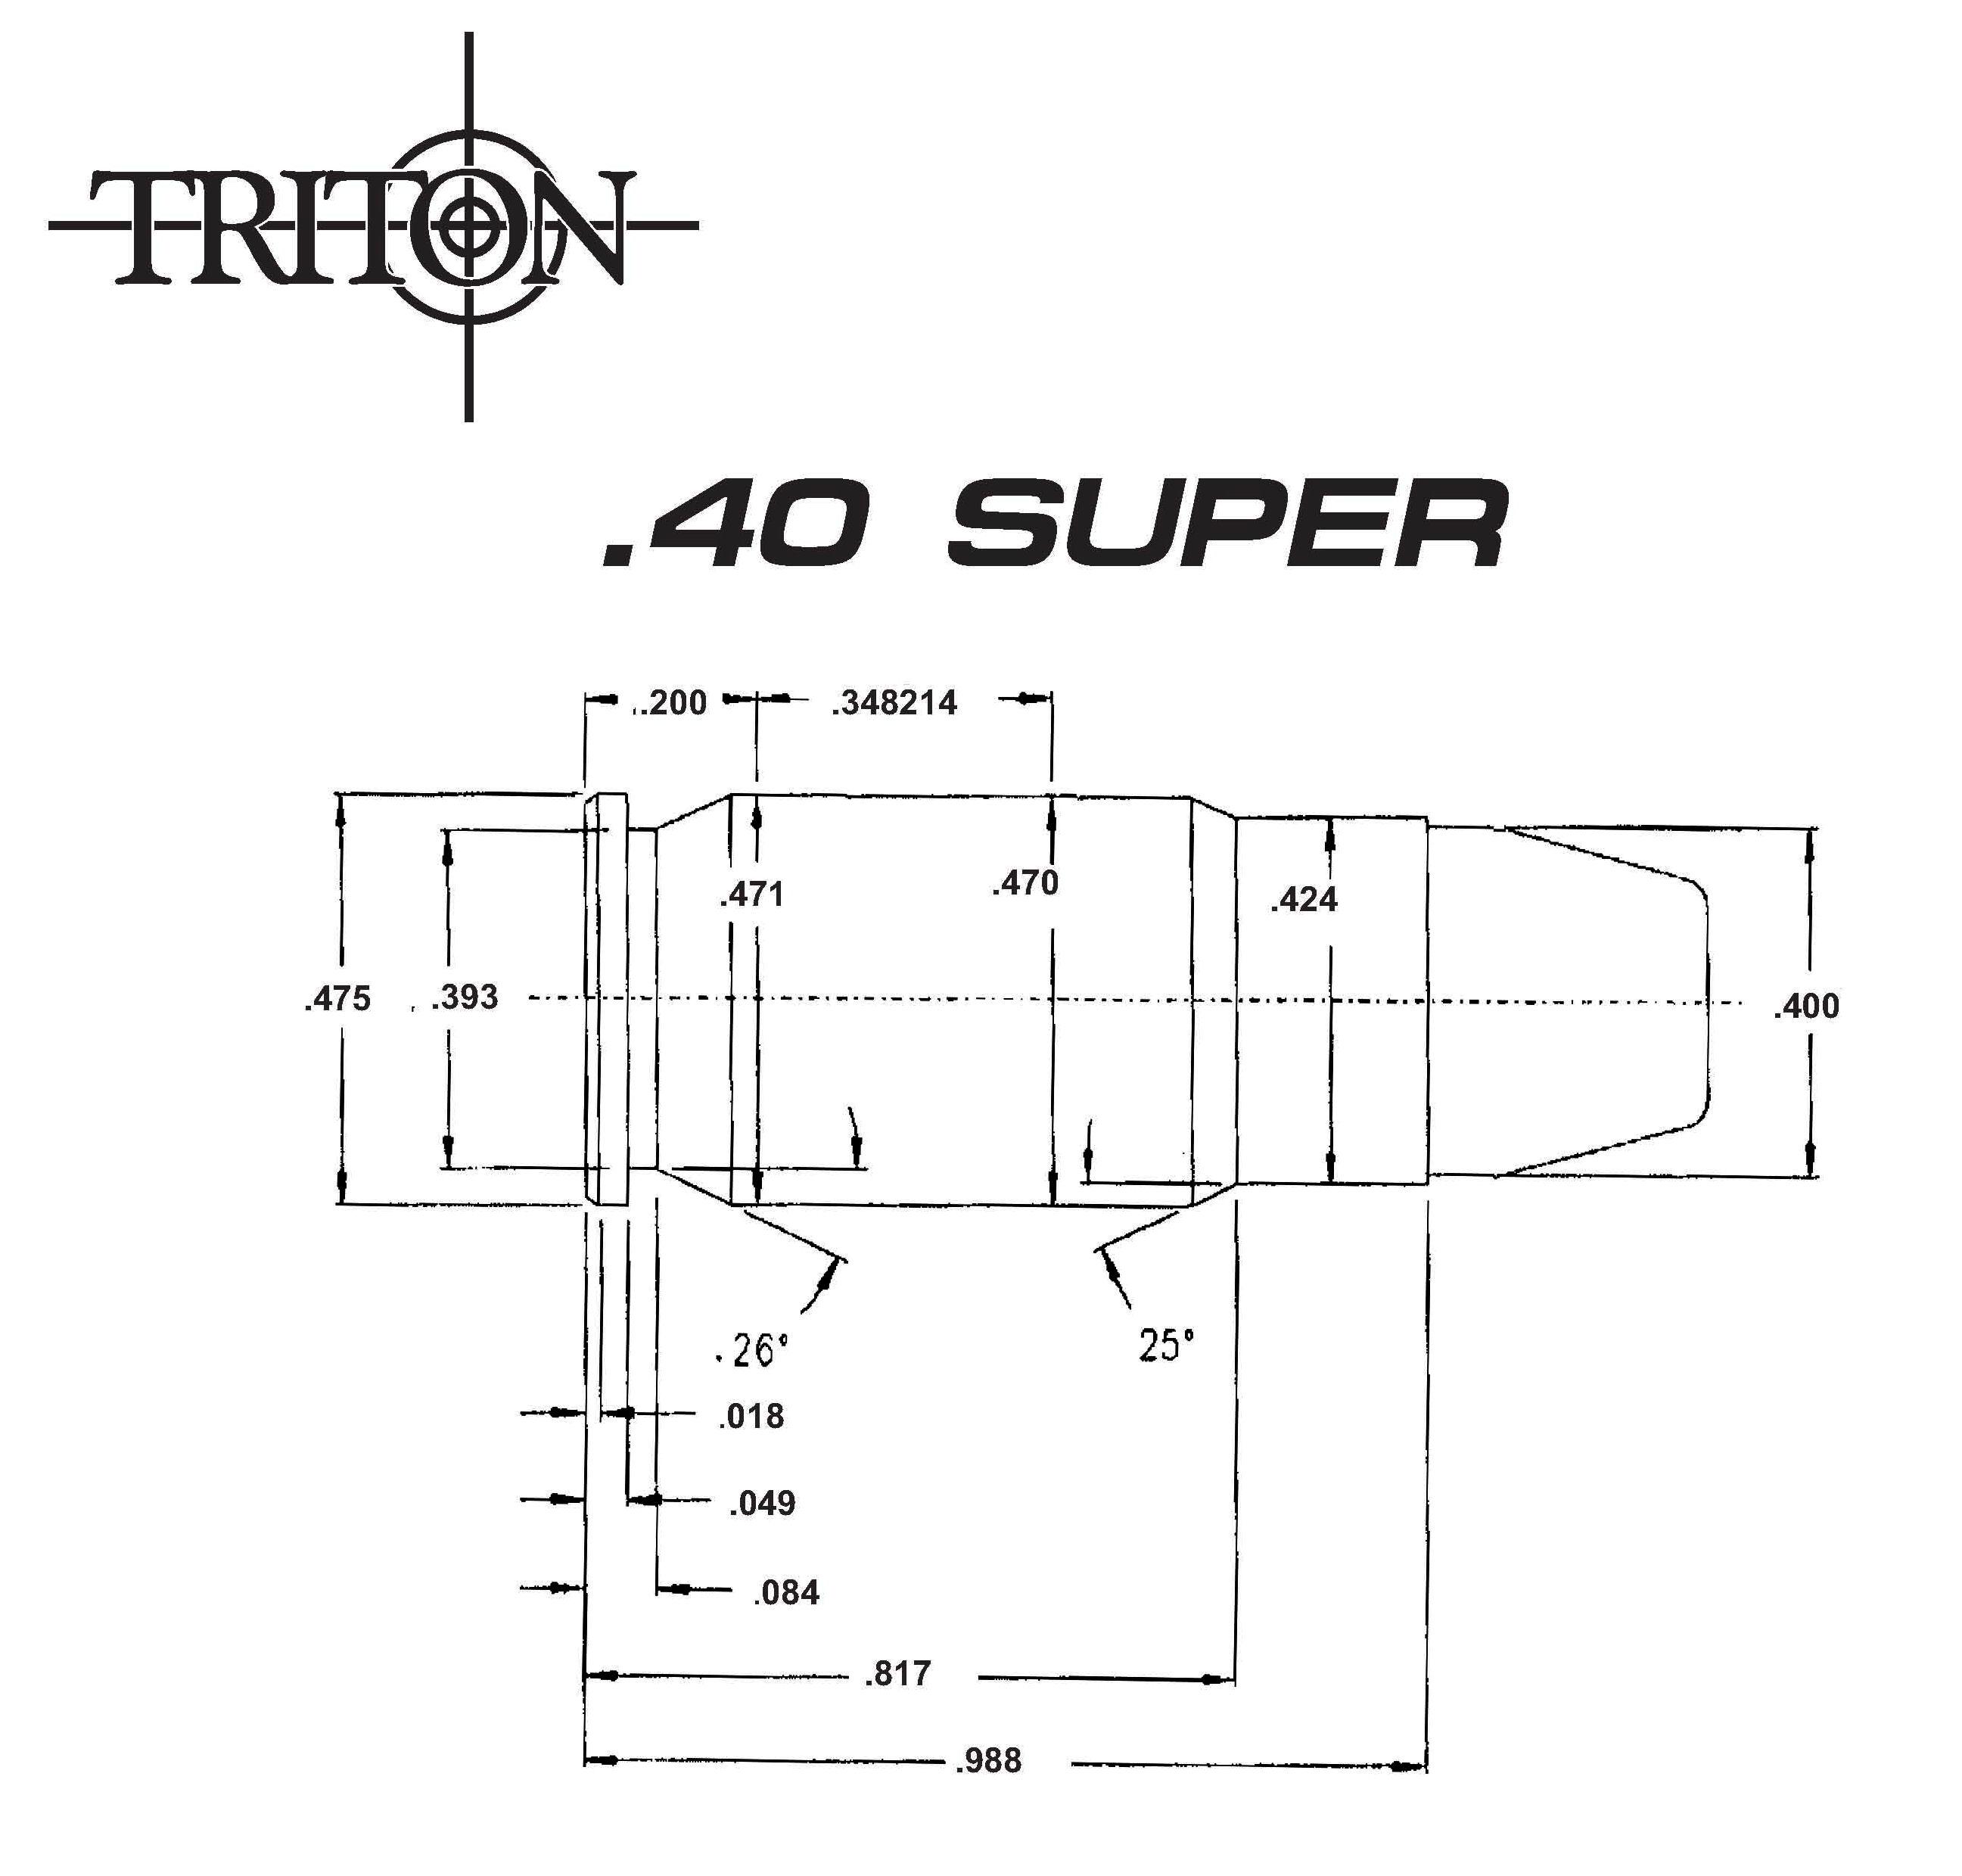 file 40 super case dimensions jpg wikipedia